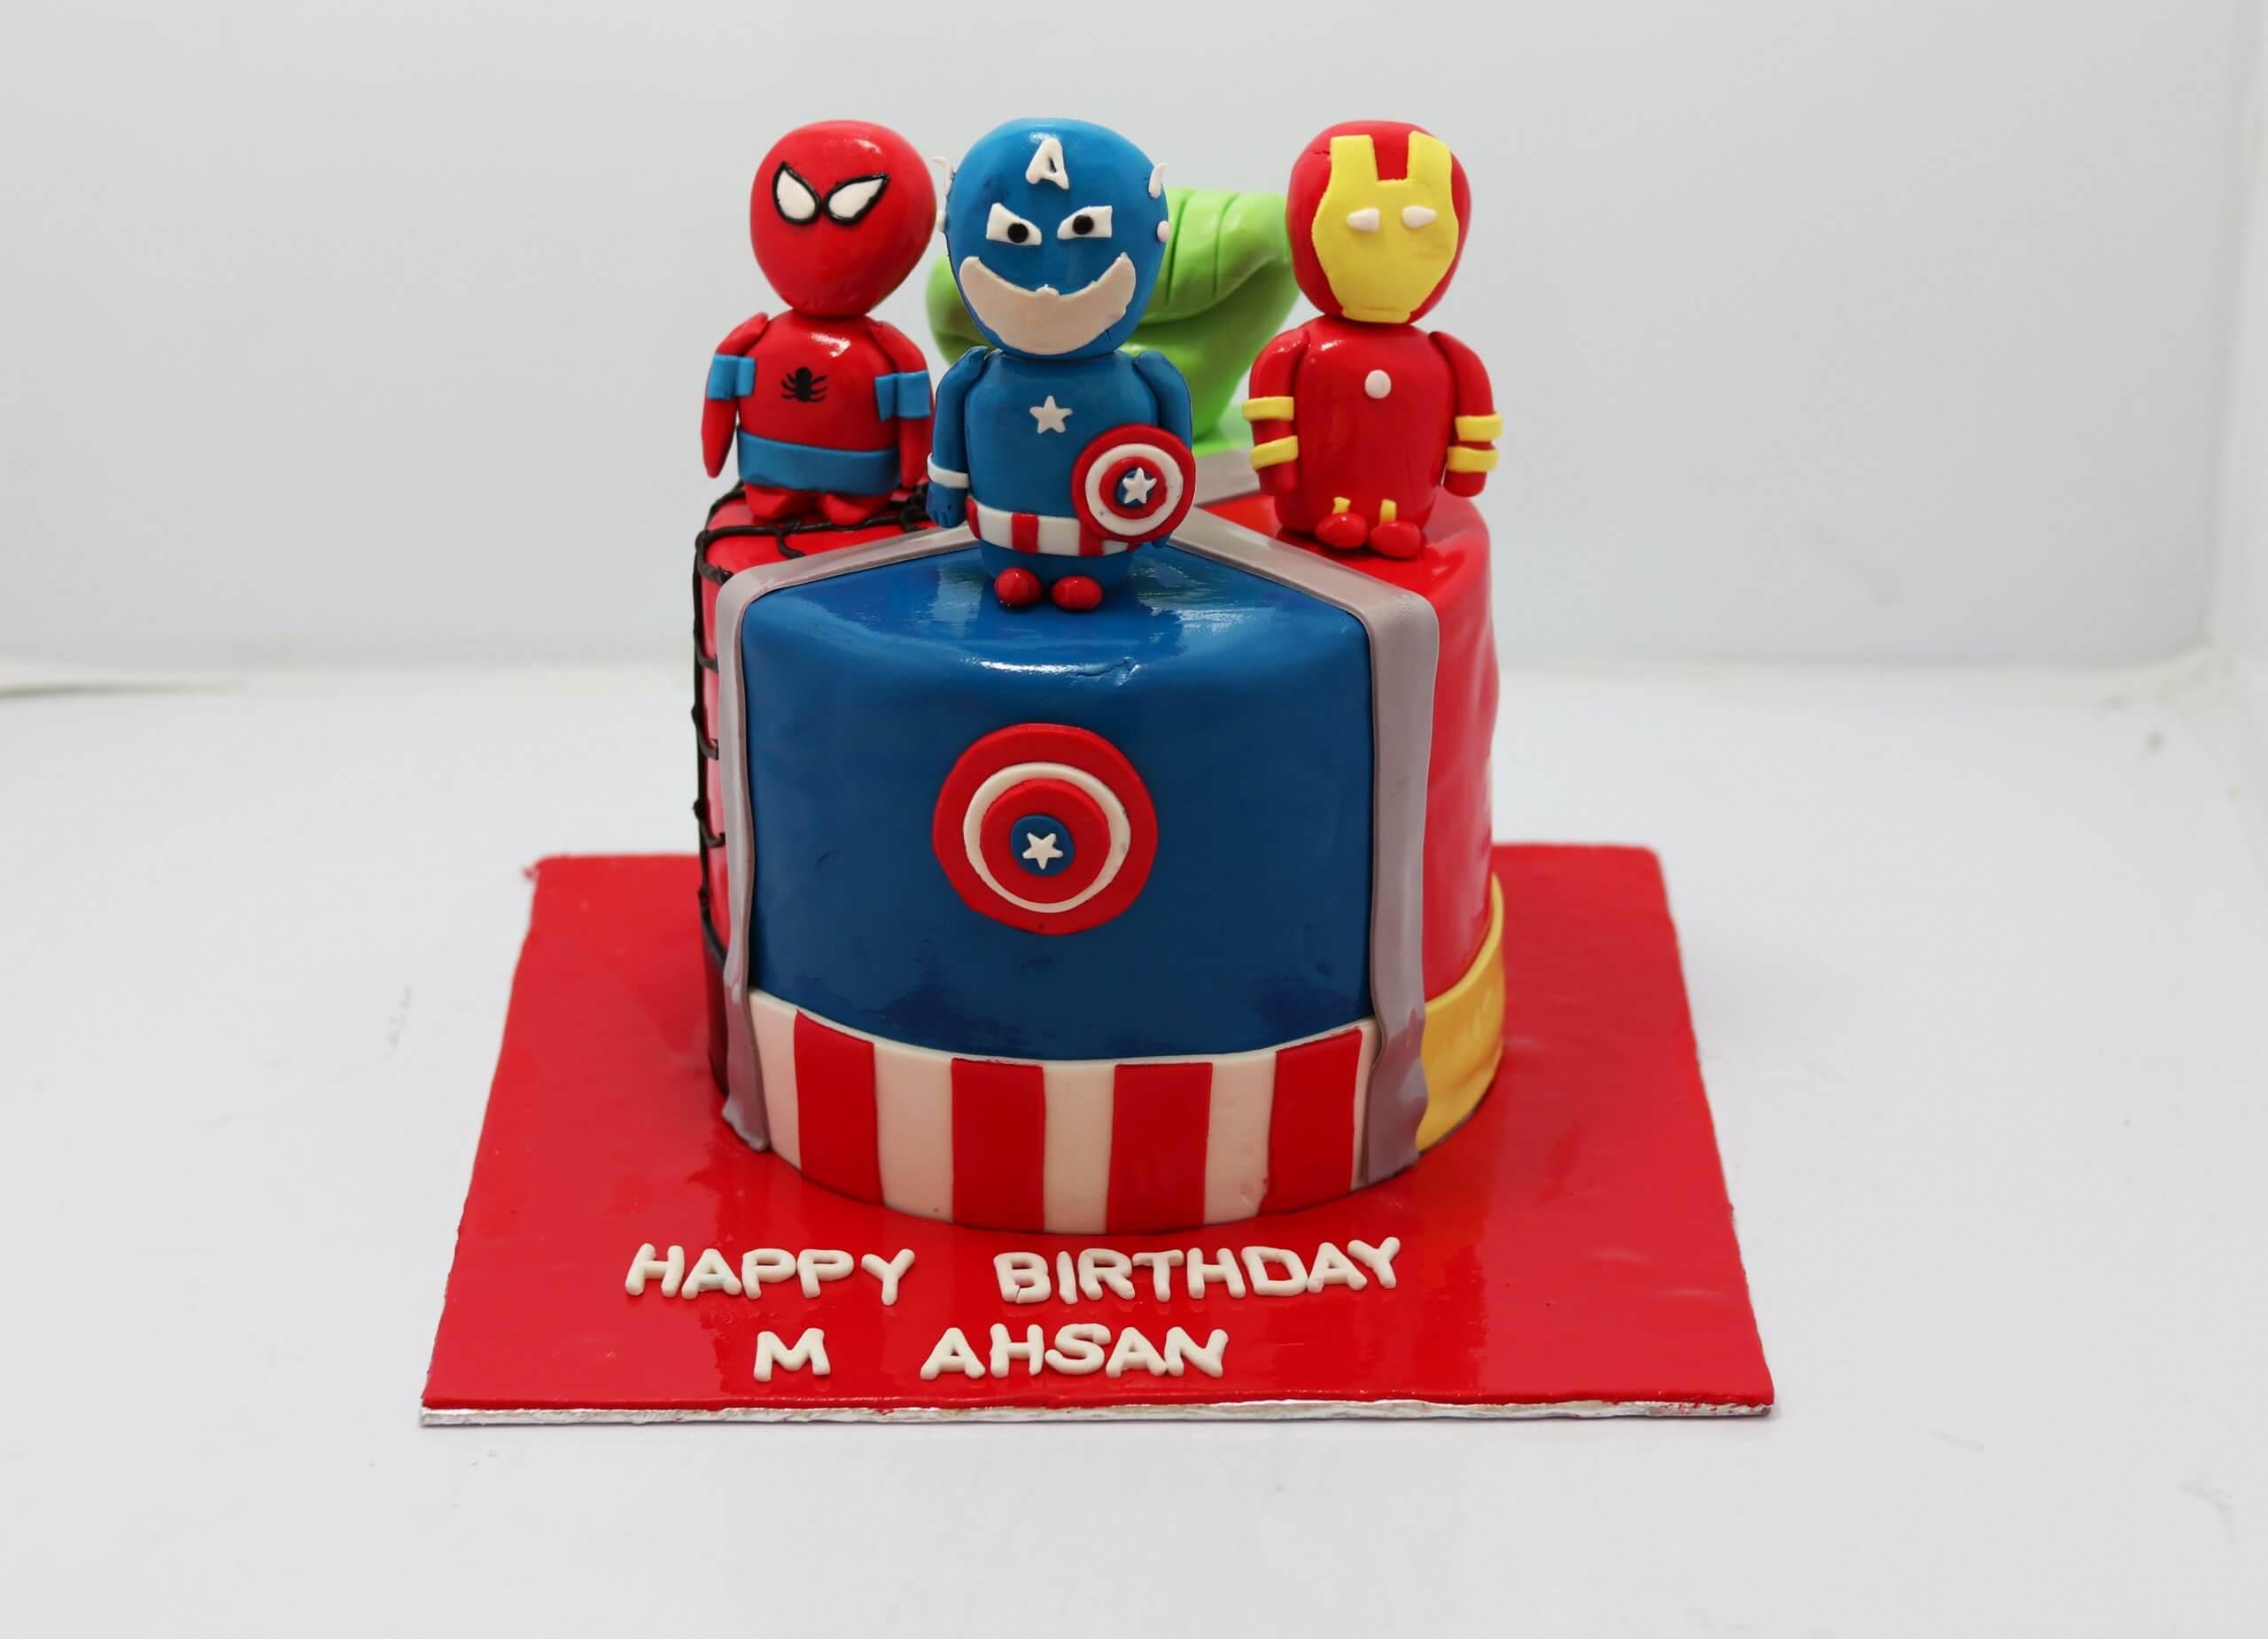 Surprising Avengers Character Cake Spiderman Super Hero Batman Birthday Cakes Funny Birthday Cards Online Fluifree Goldxyz